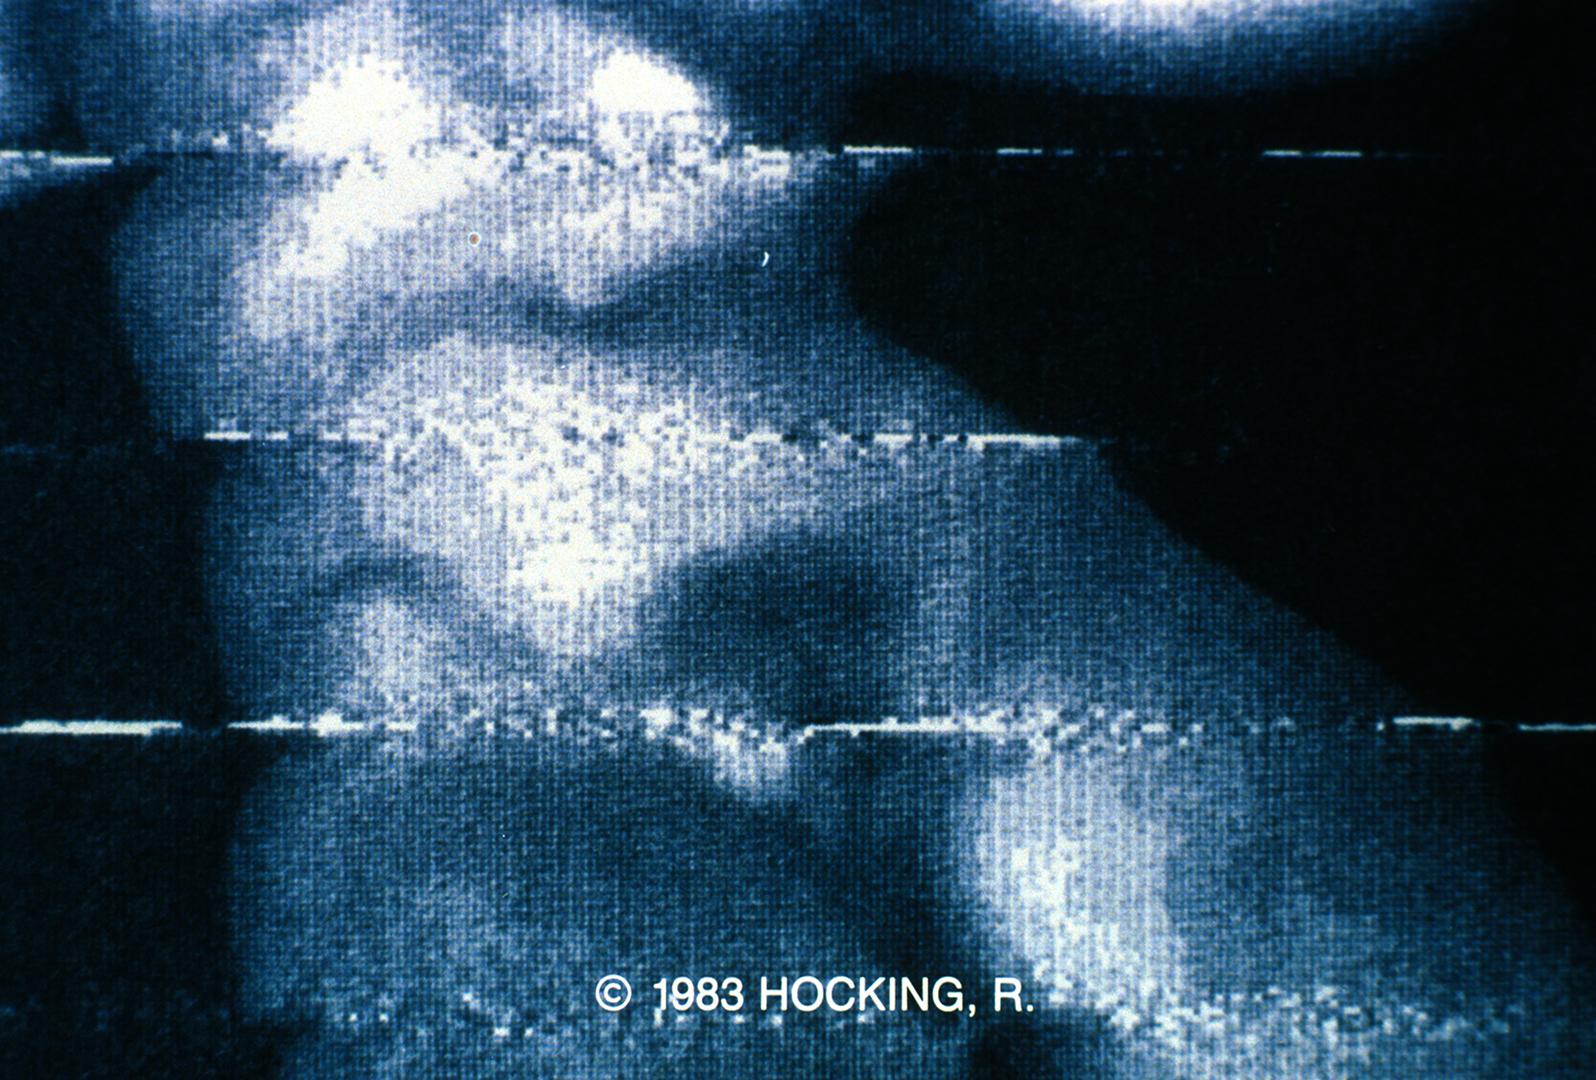 ©1983, Ralph Hocking